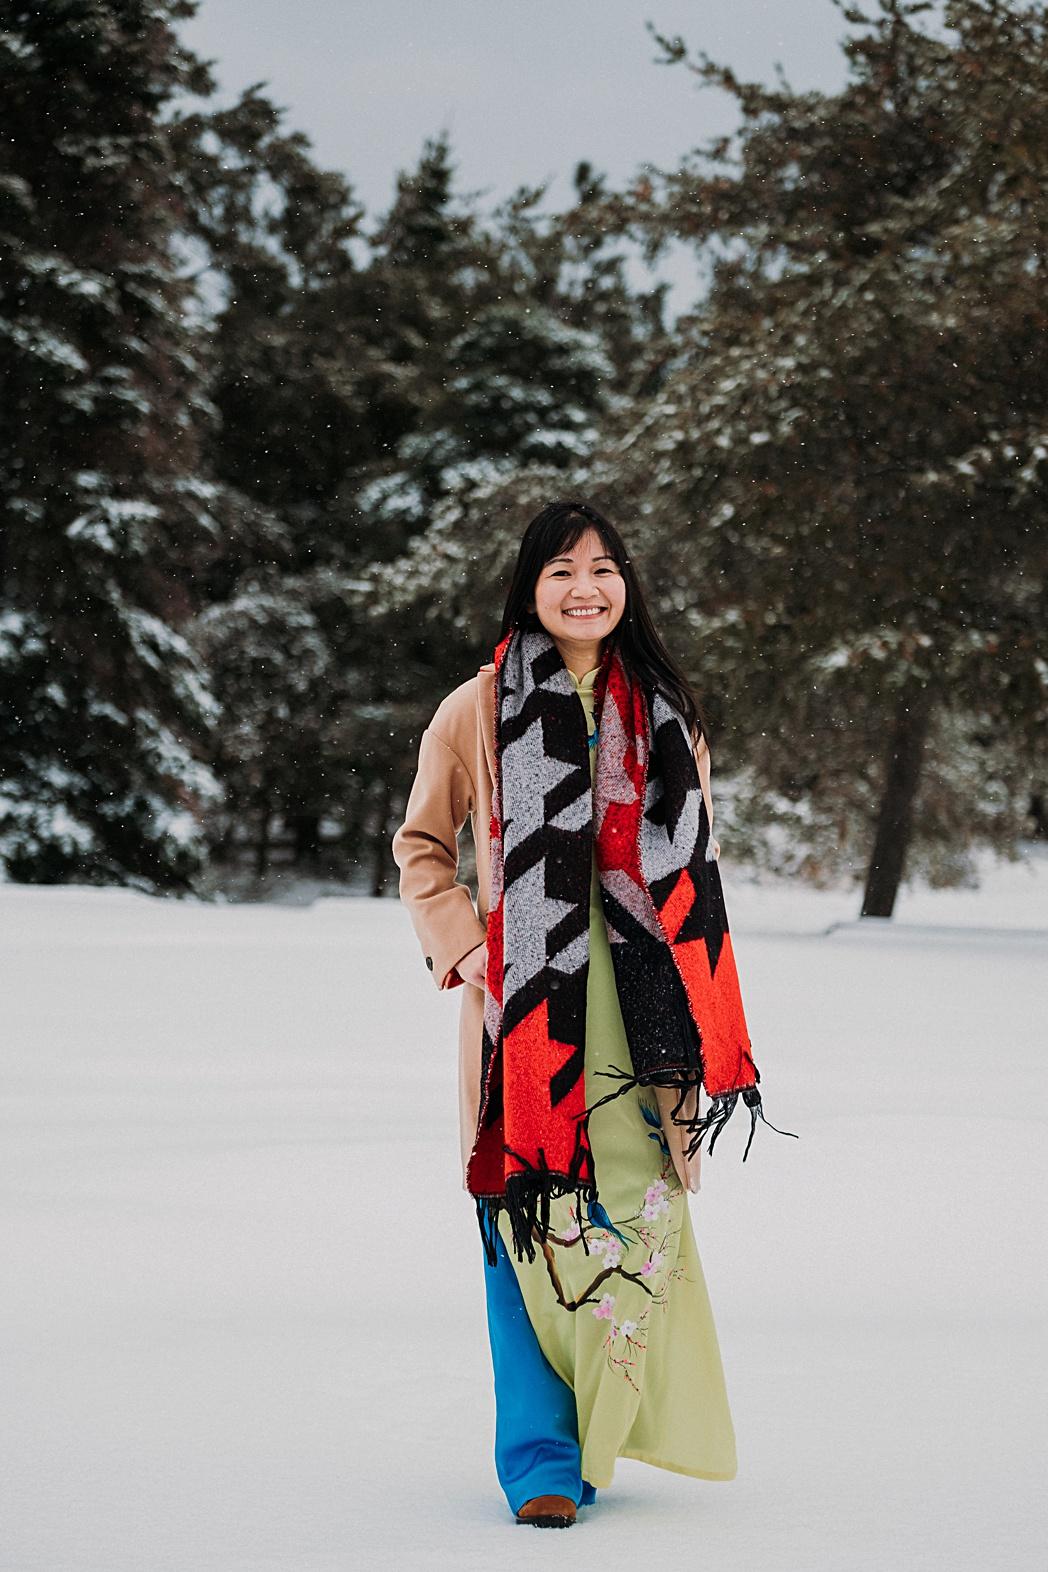 Traverse City Winter Photographer